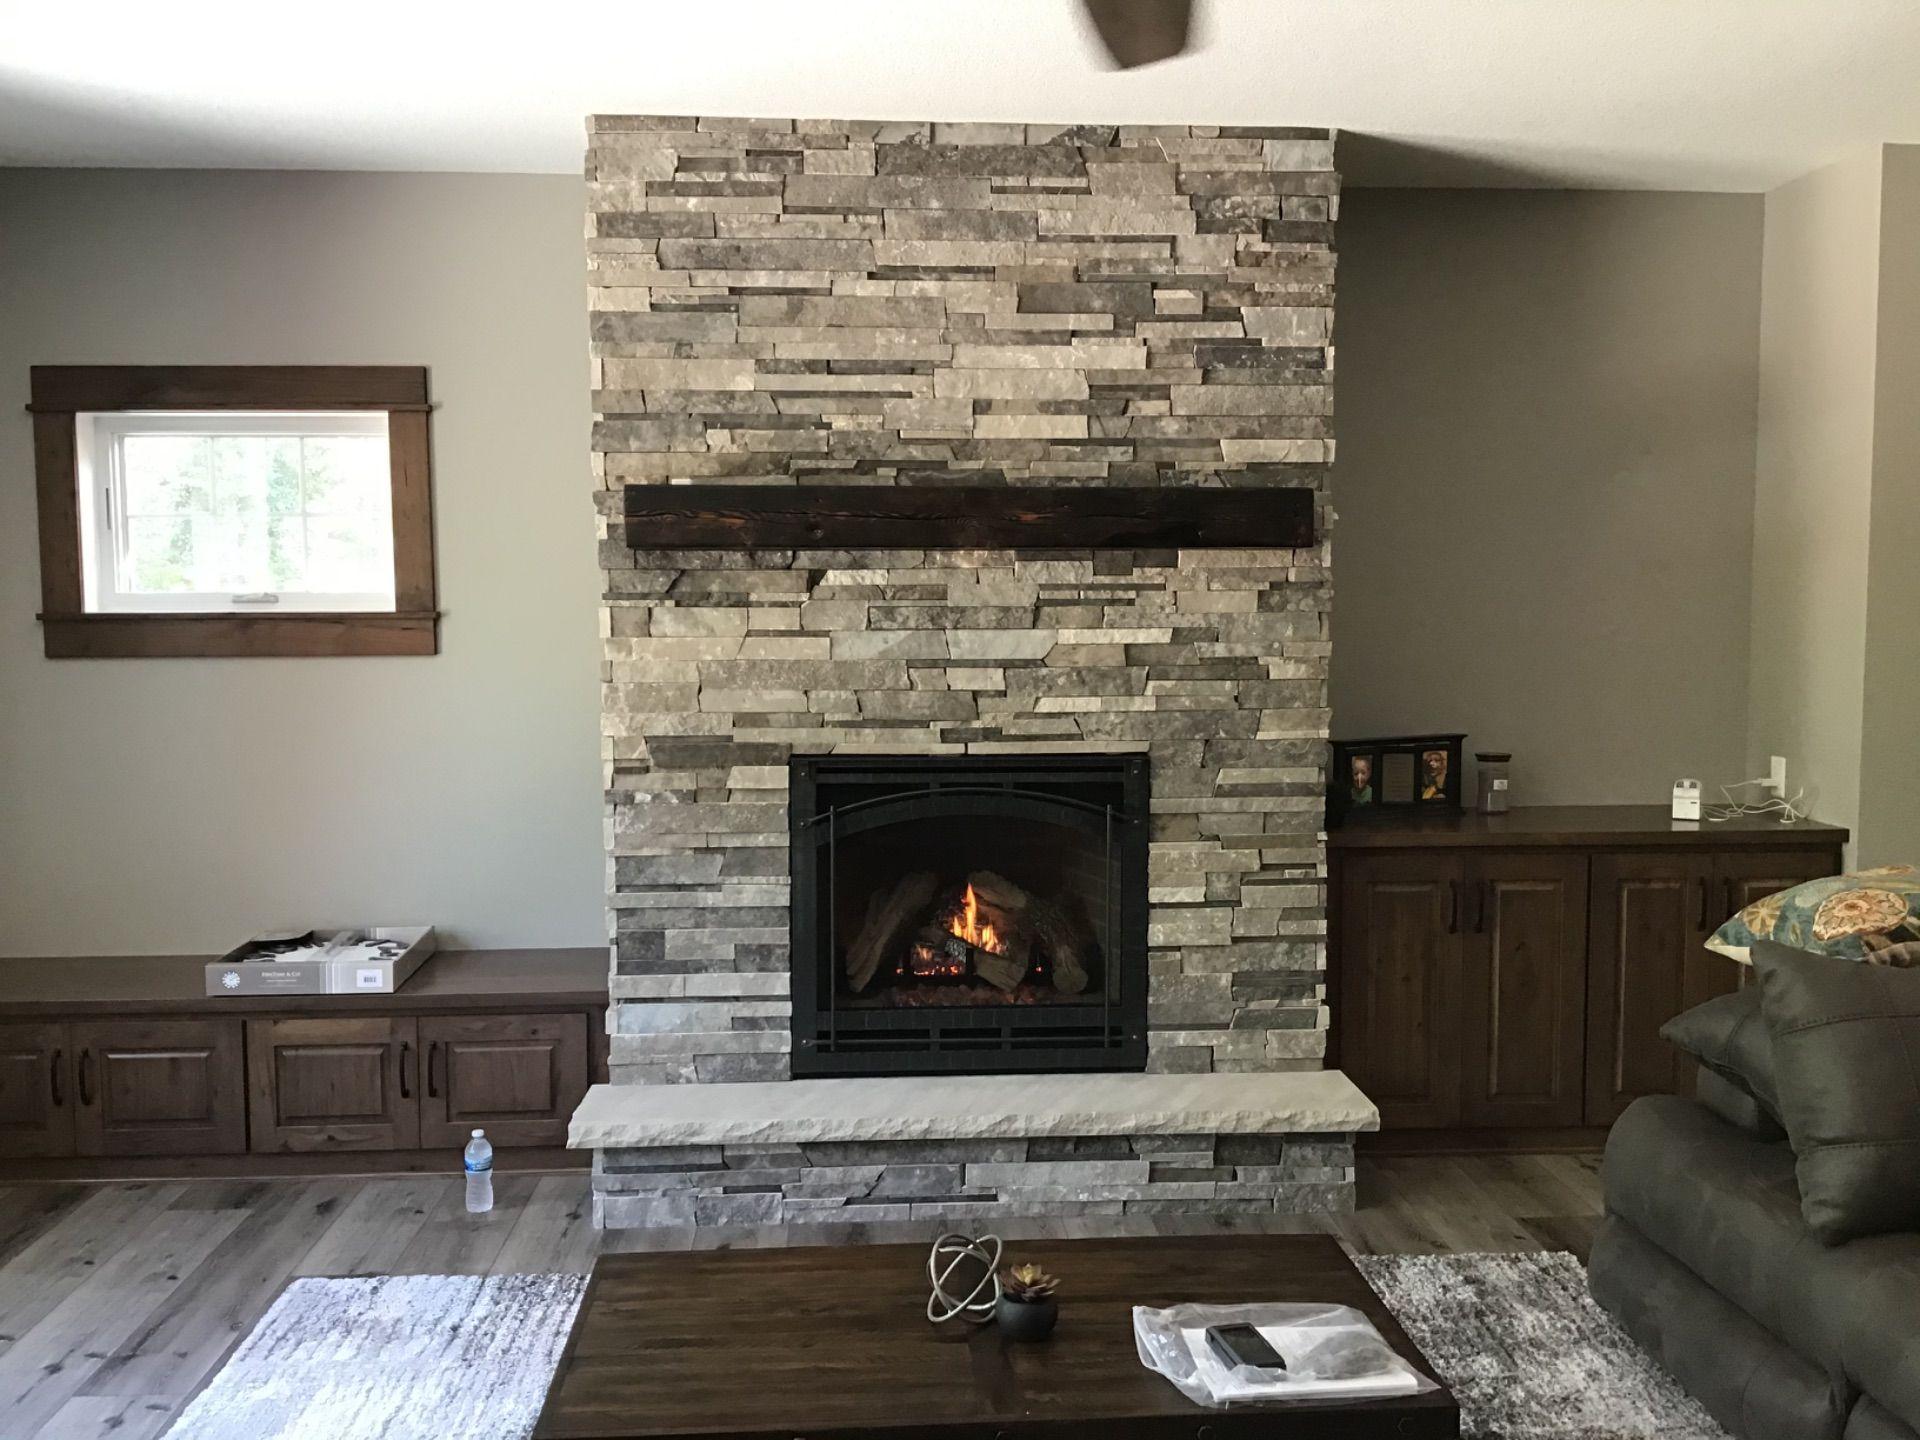 Traditional Fireplace In 2020 Traditional Fireplace Fireplace Gas Fireplace